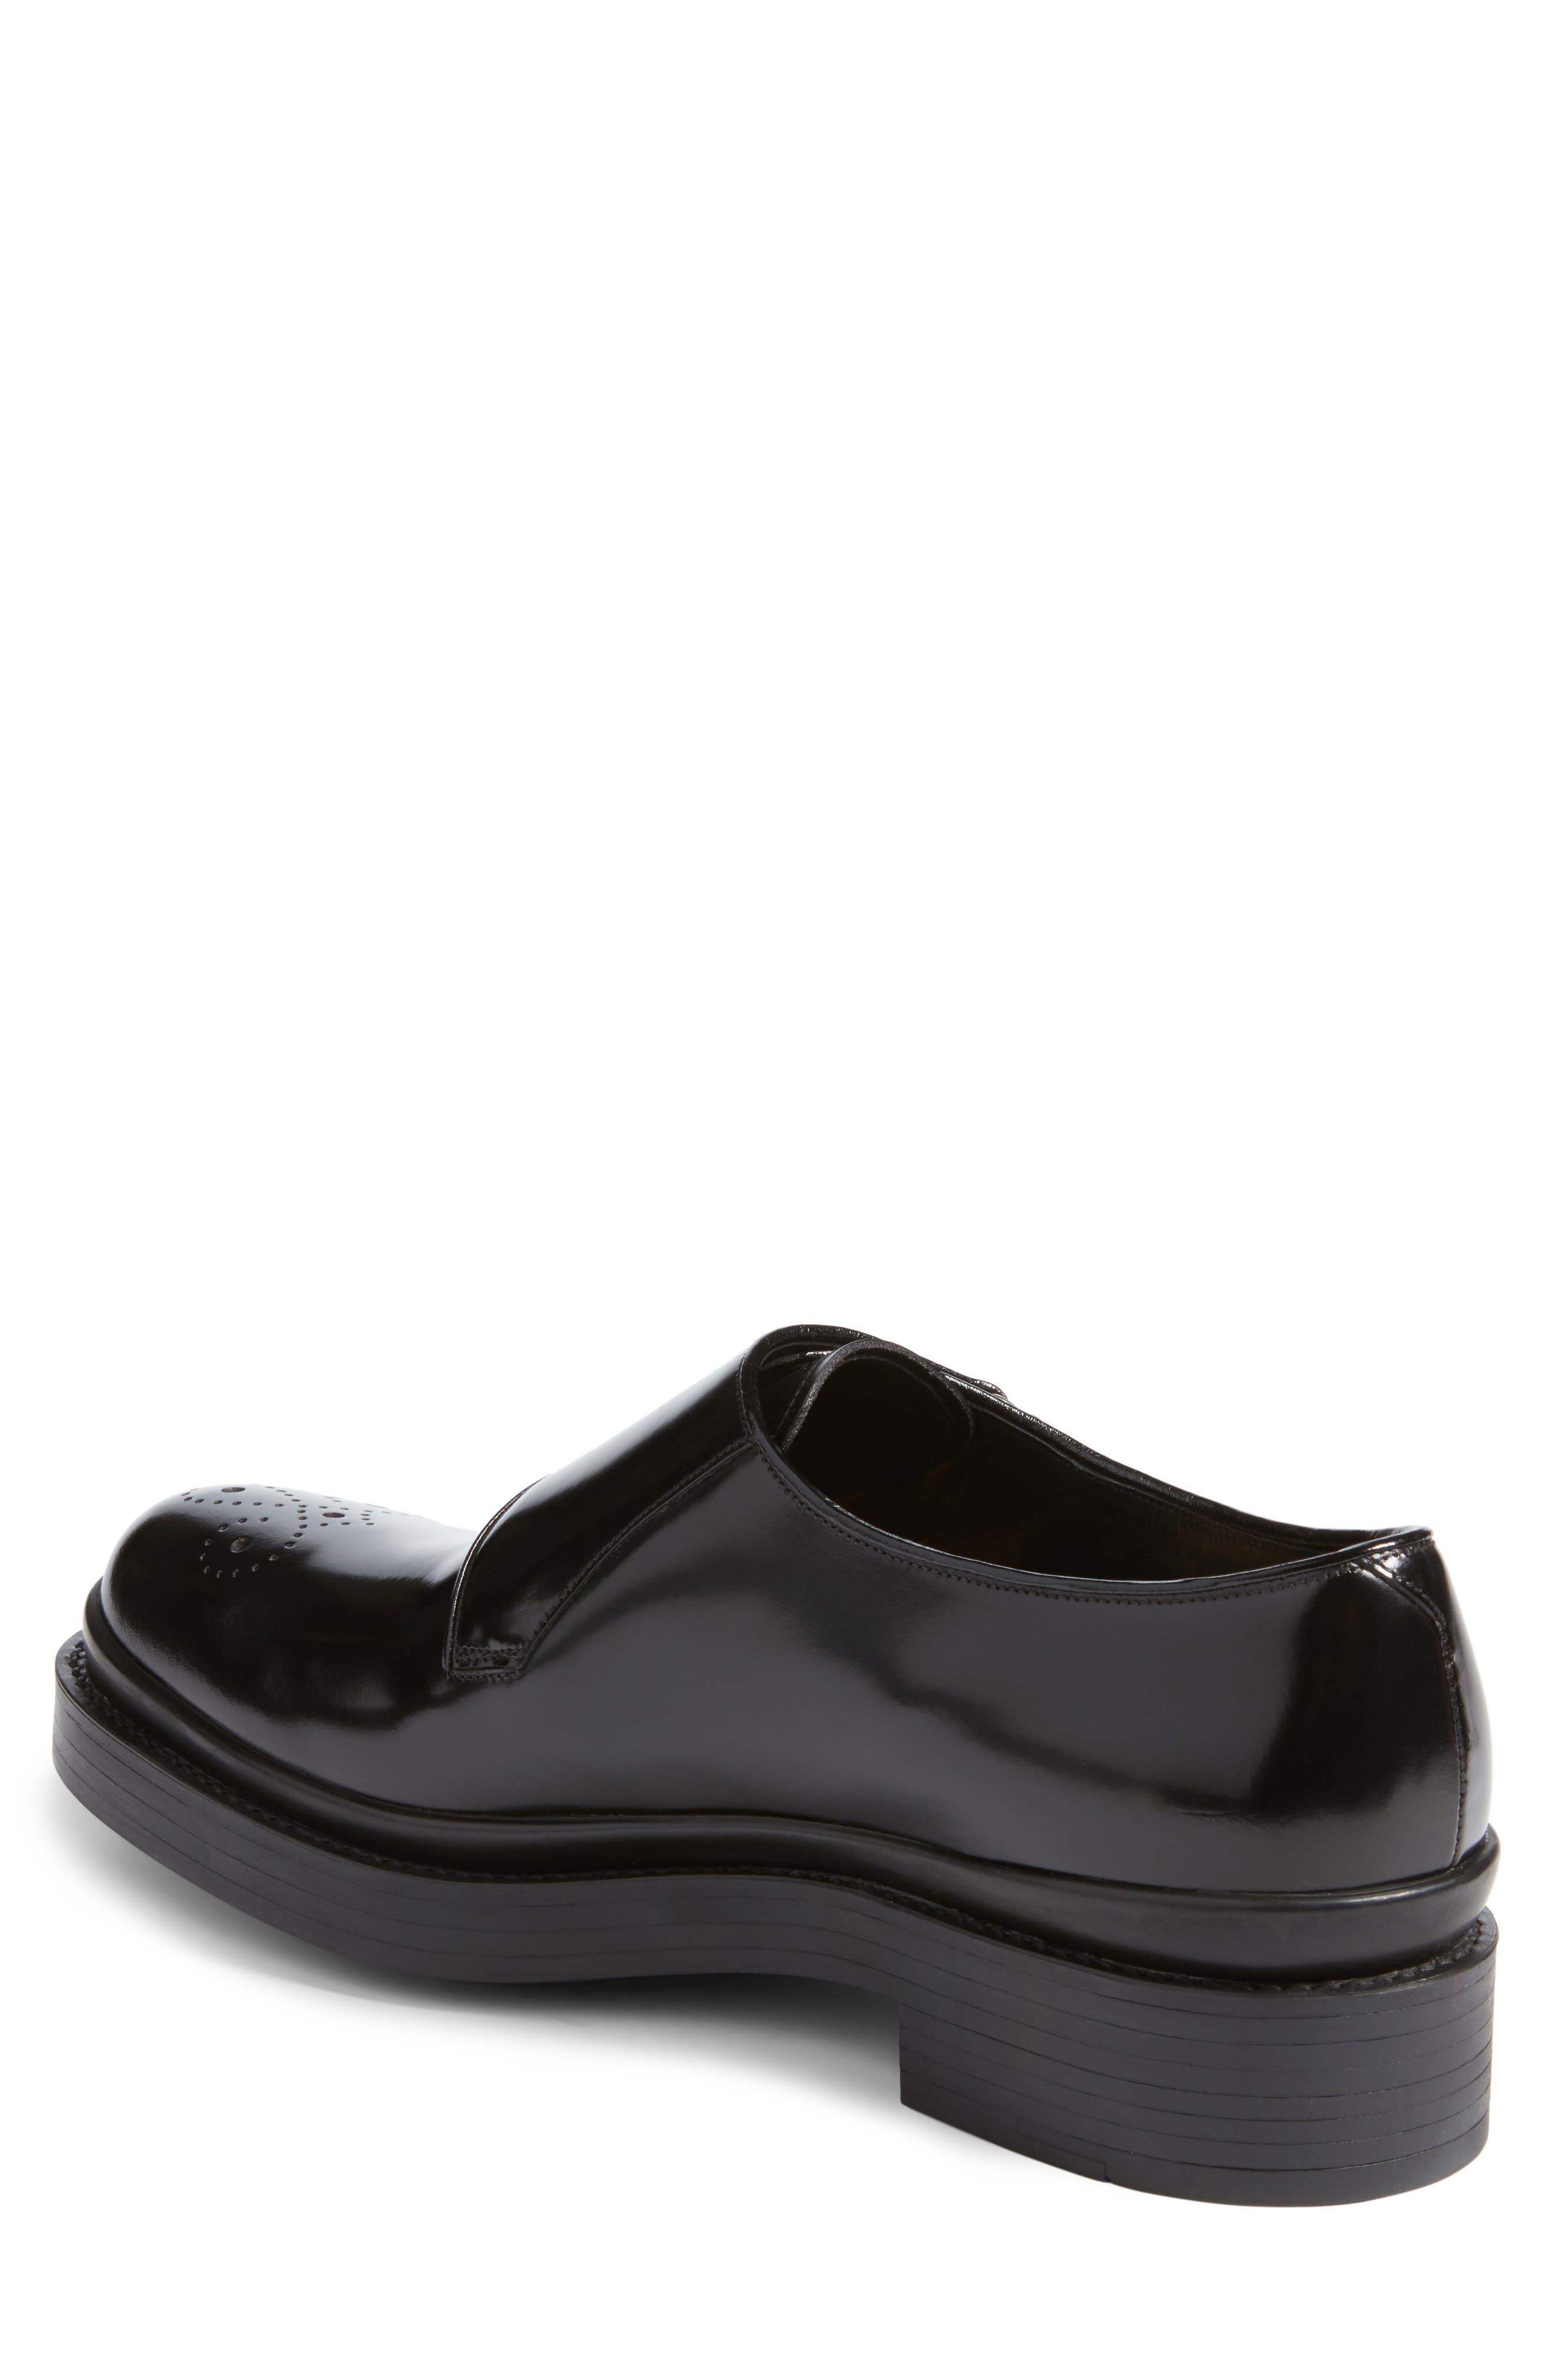 Alternate Image 2  - Prada Double Monk Strap Shoe (Men)